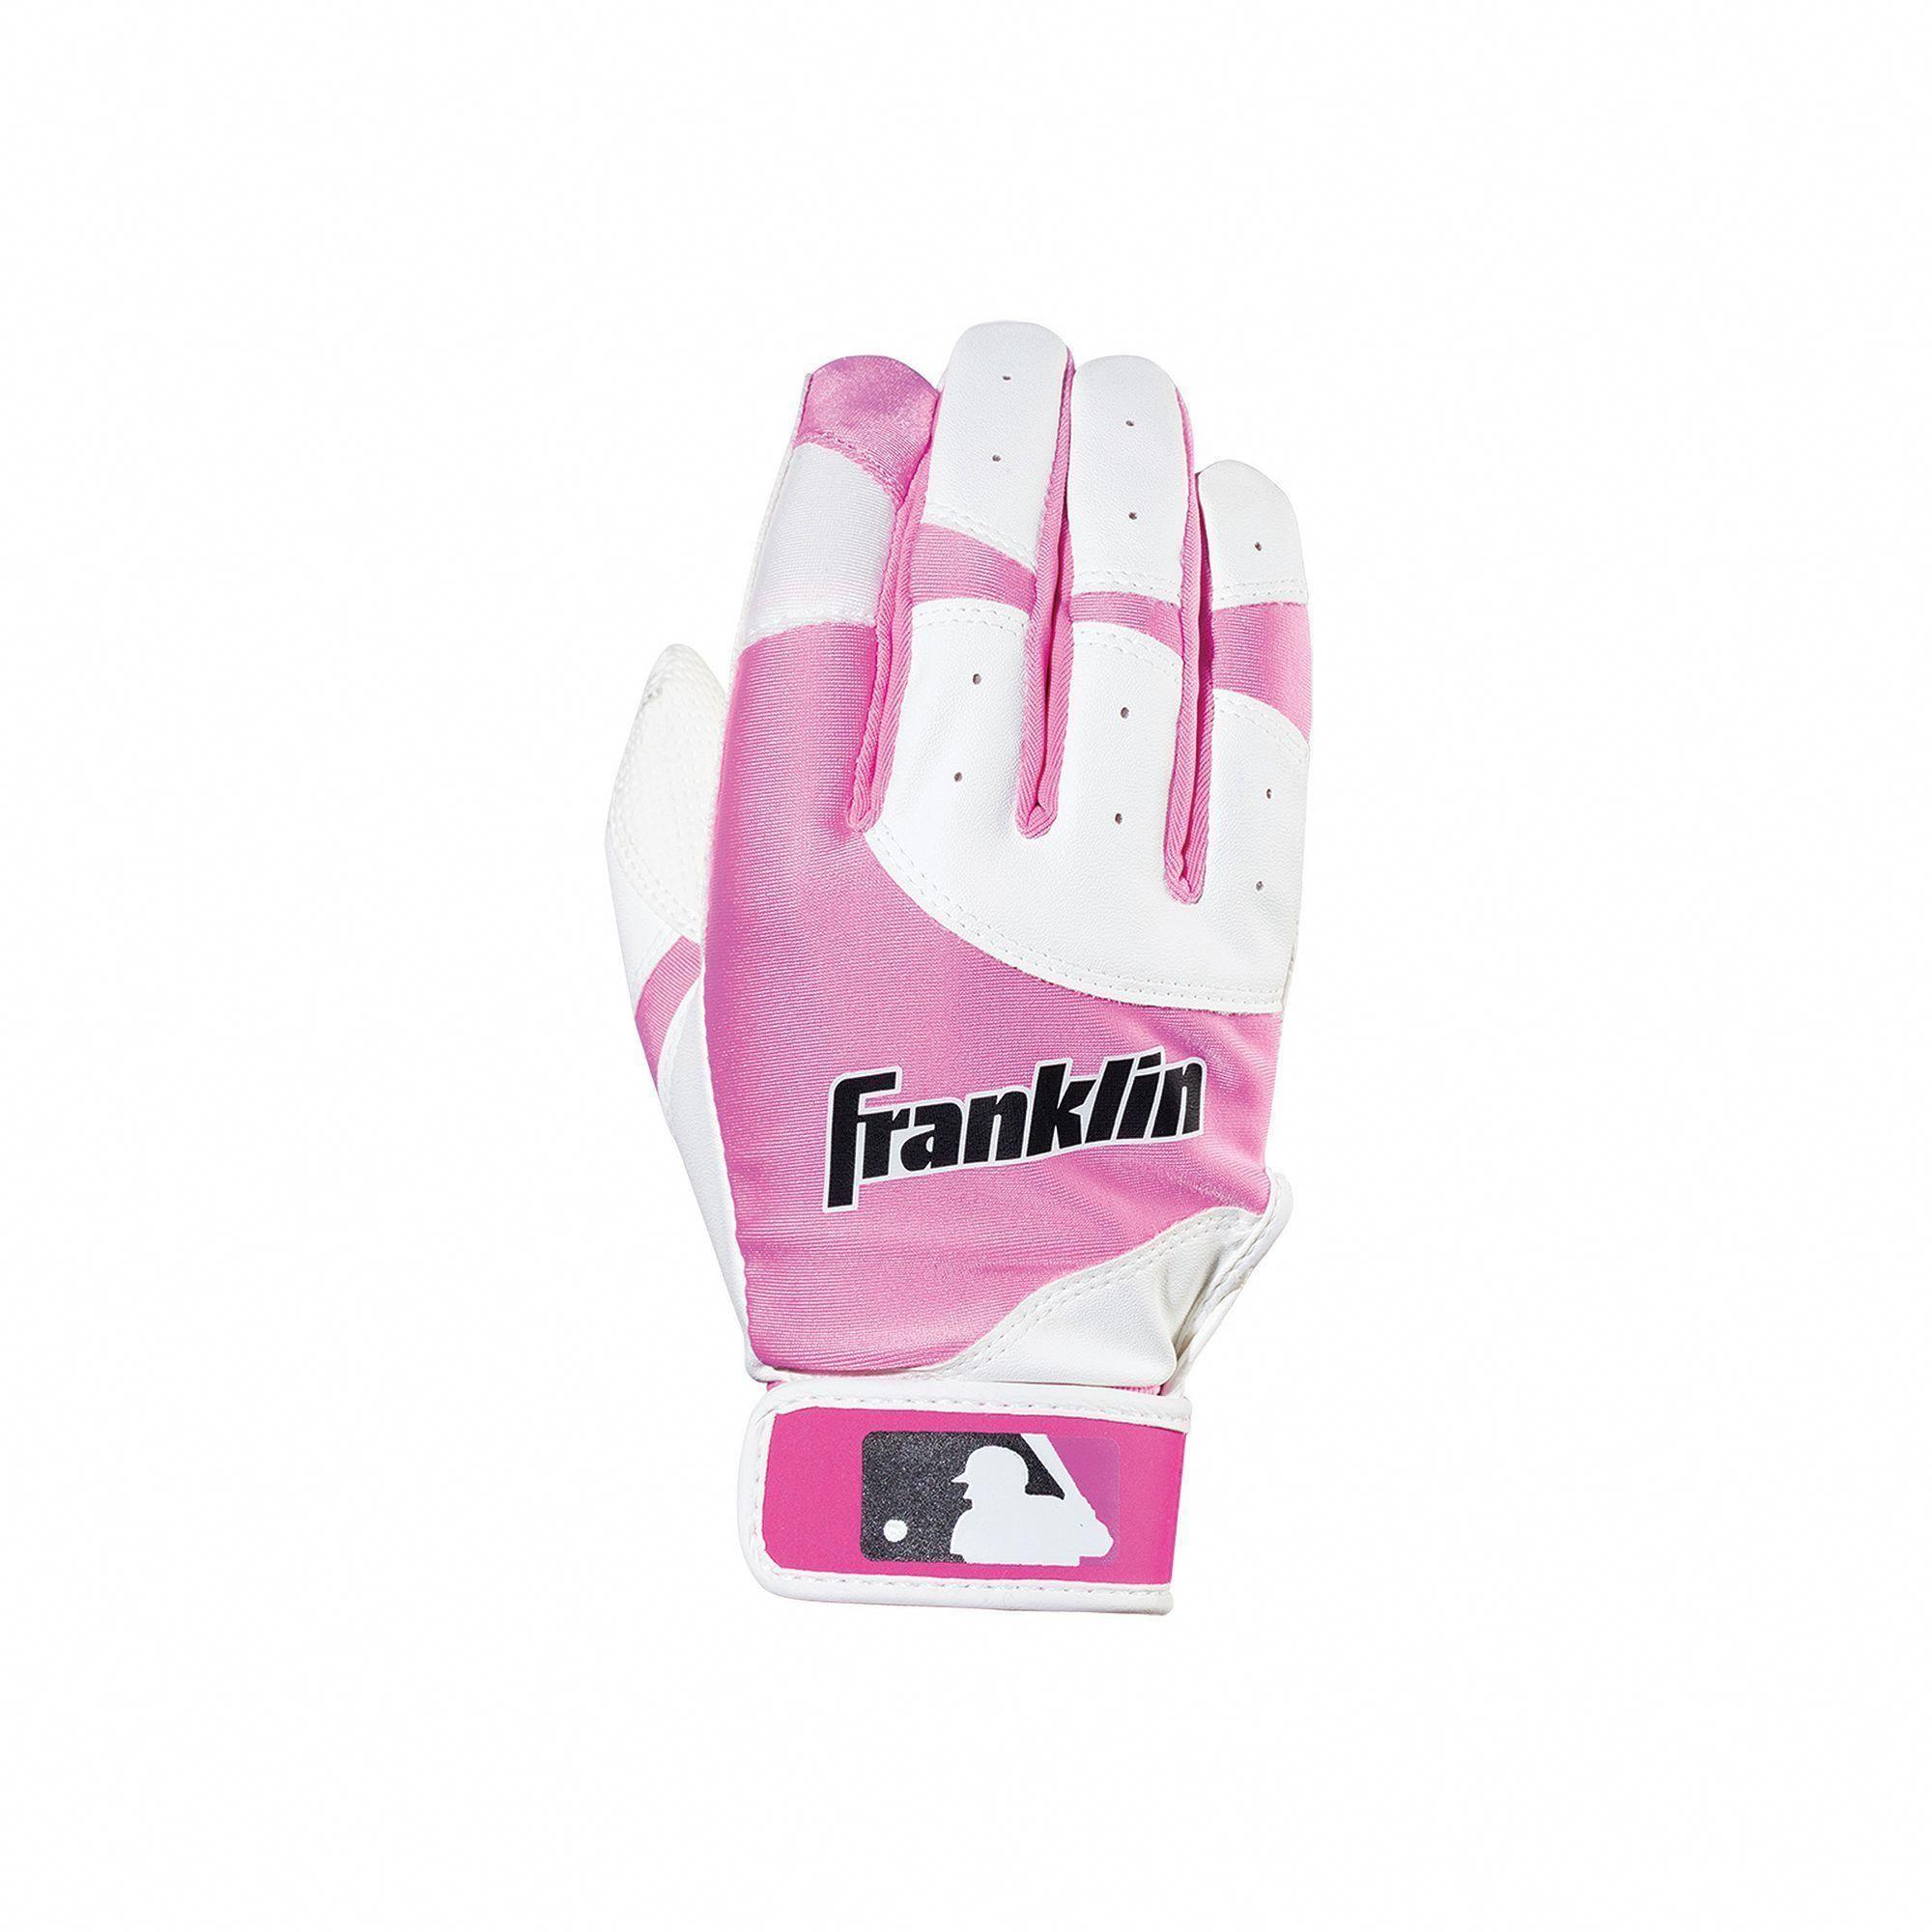 Franklin Youth Flex Batting Glove Multicolor Durable